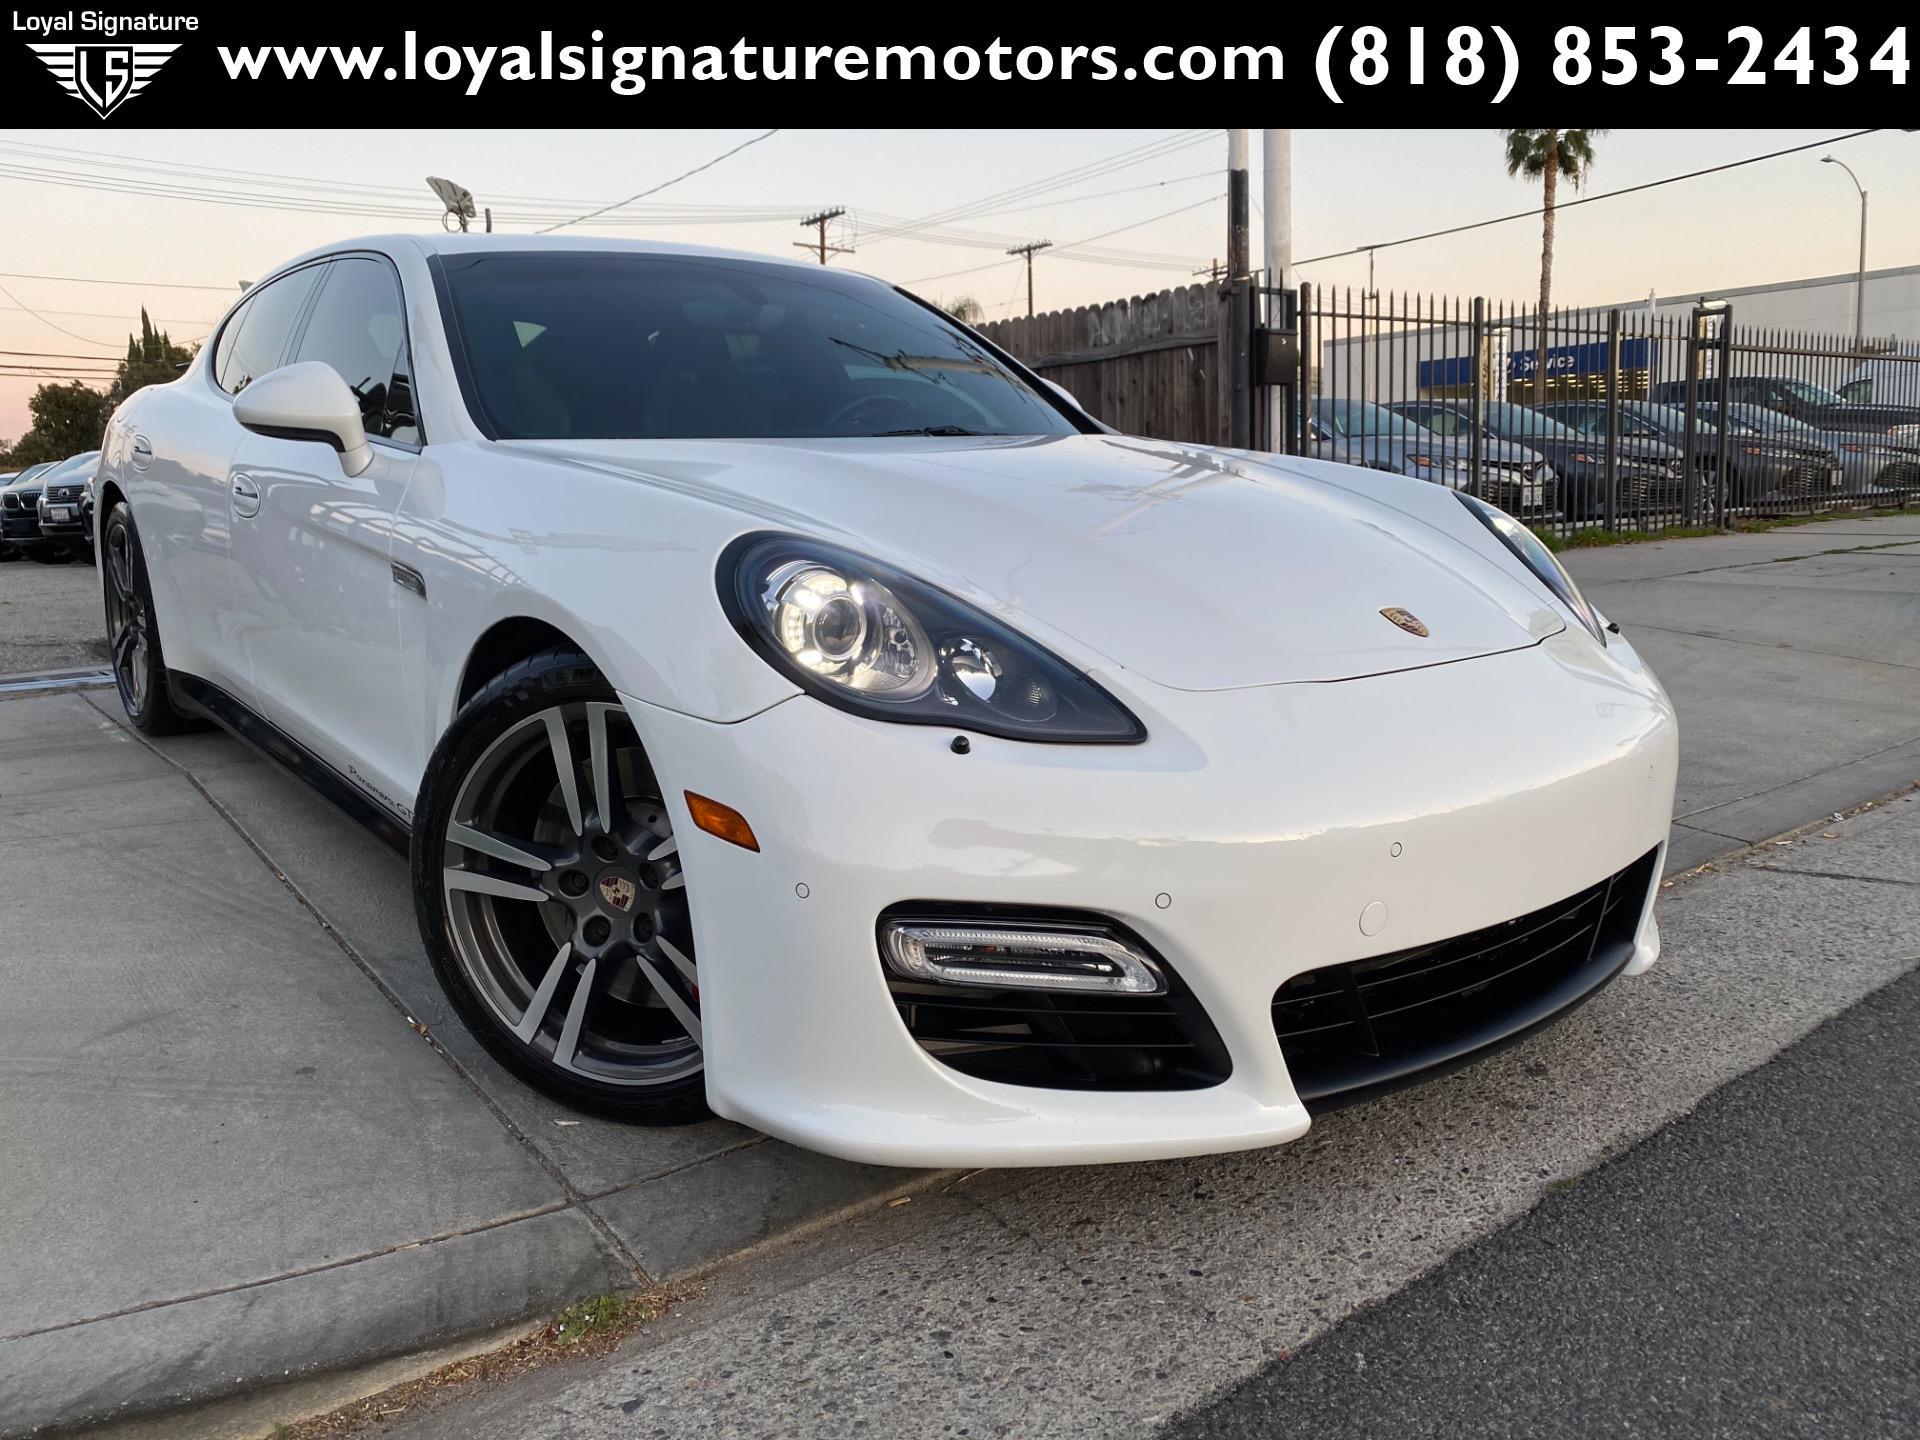 Used 2013 Porsche Panamera GTS | Van Nuys, CA